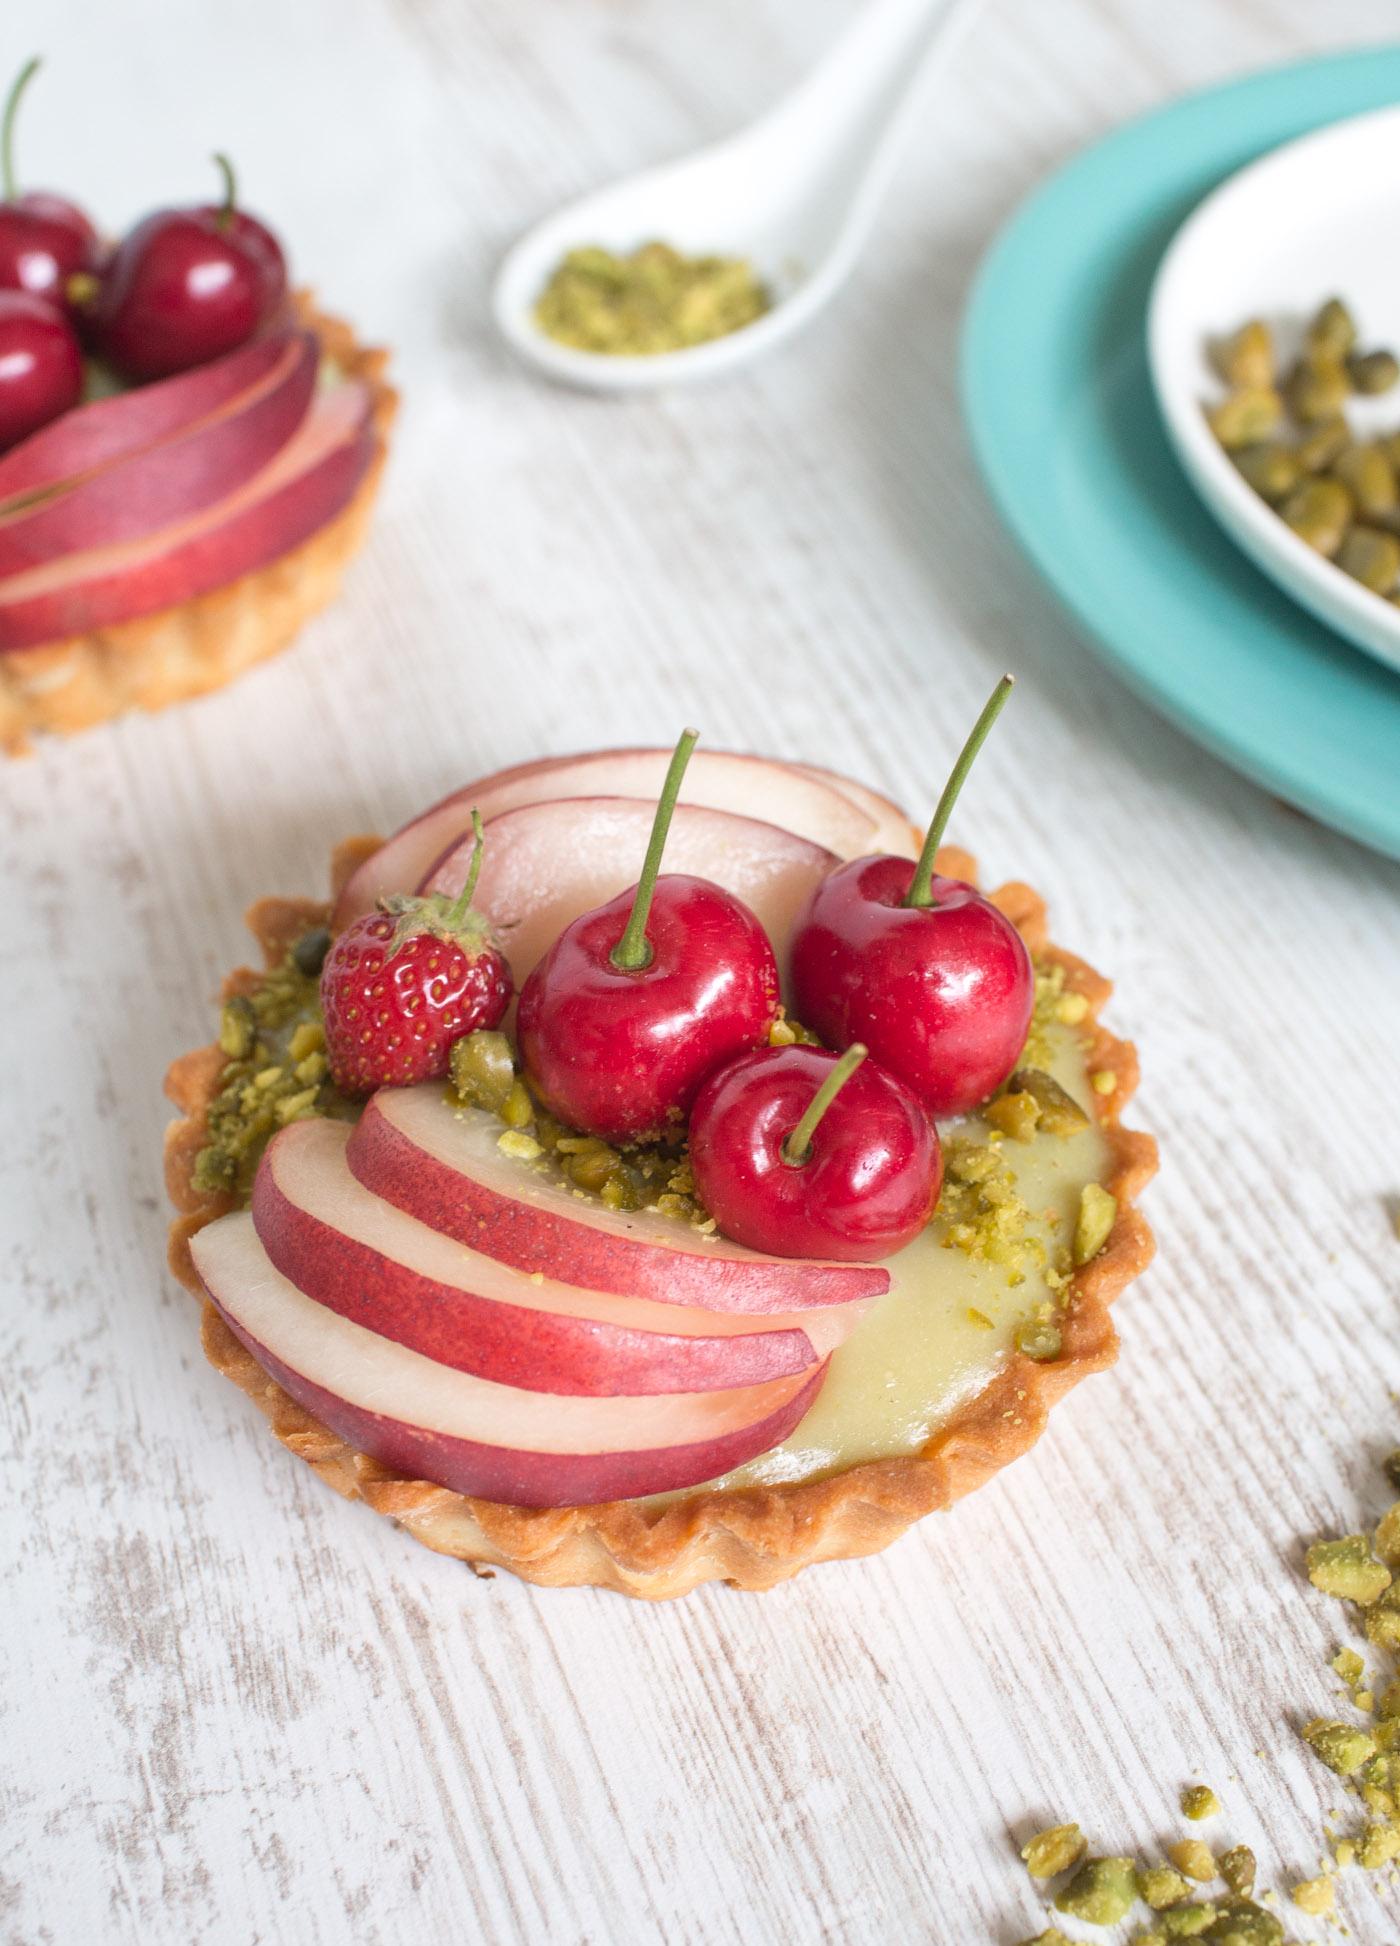 Blanccoco_Photographe_Tartelettes_pistache_fruits_styliste_culinaire-4